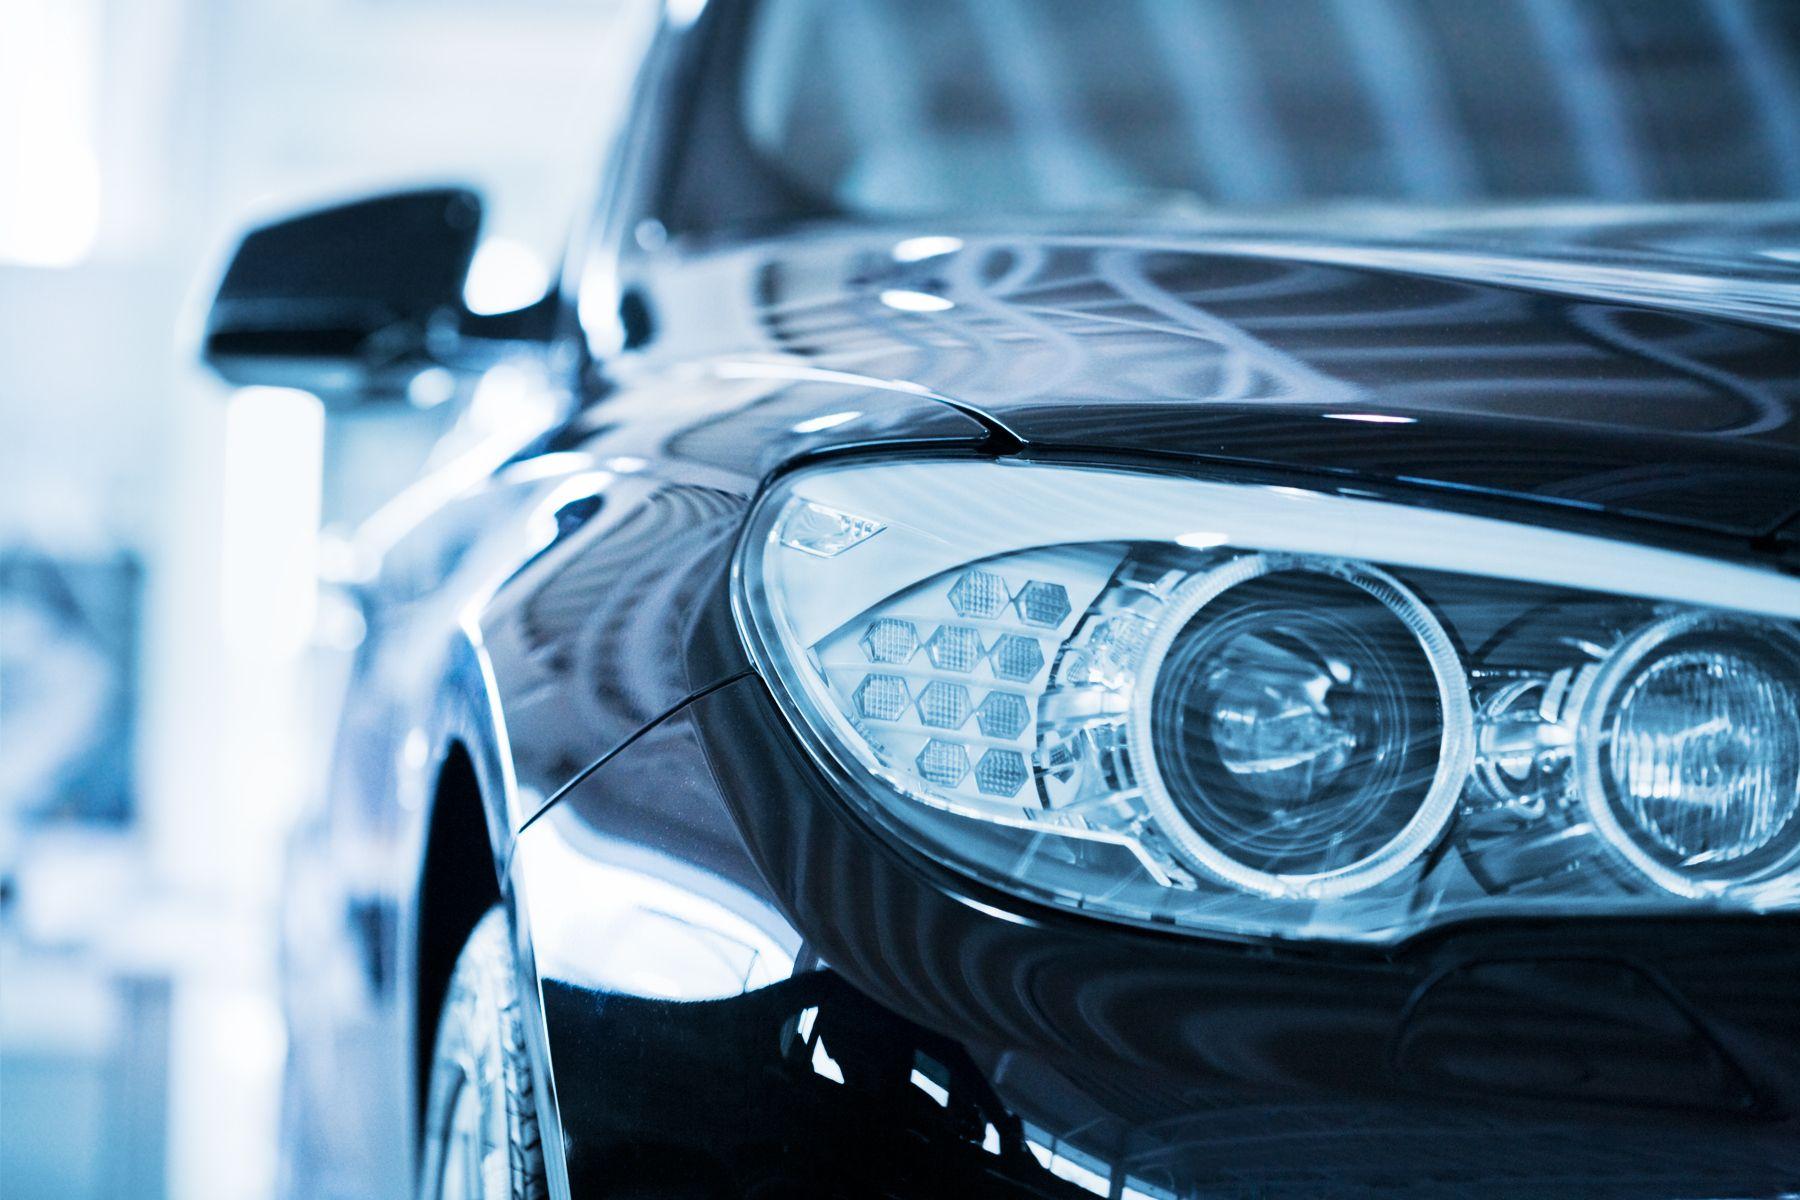 Reparación de vehículos: Servicios de Taller de Chévere